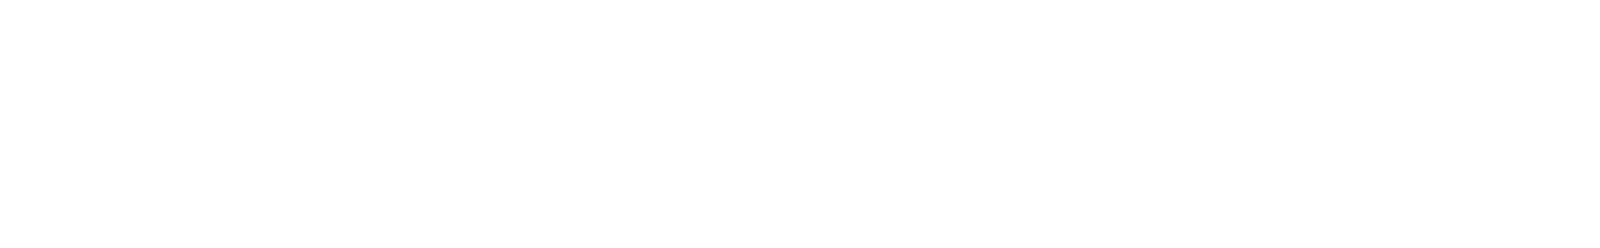 WNMU-TV PBS